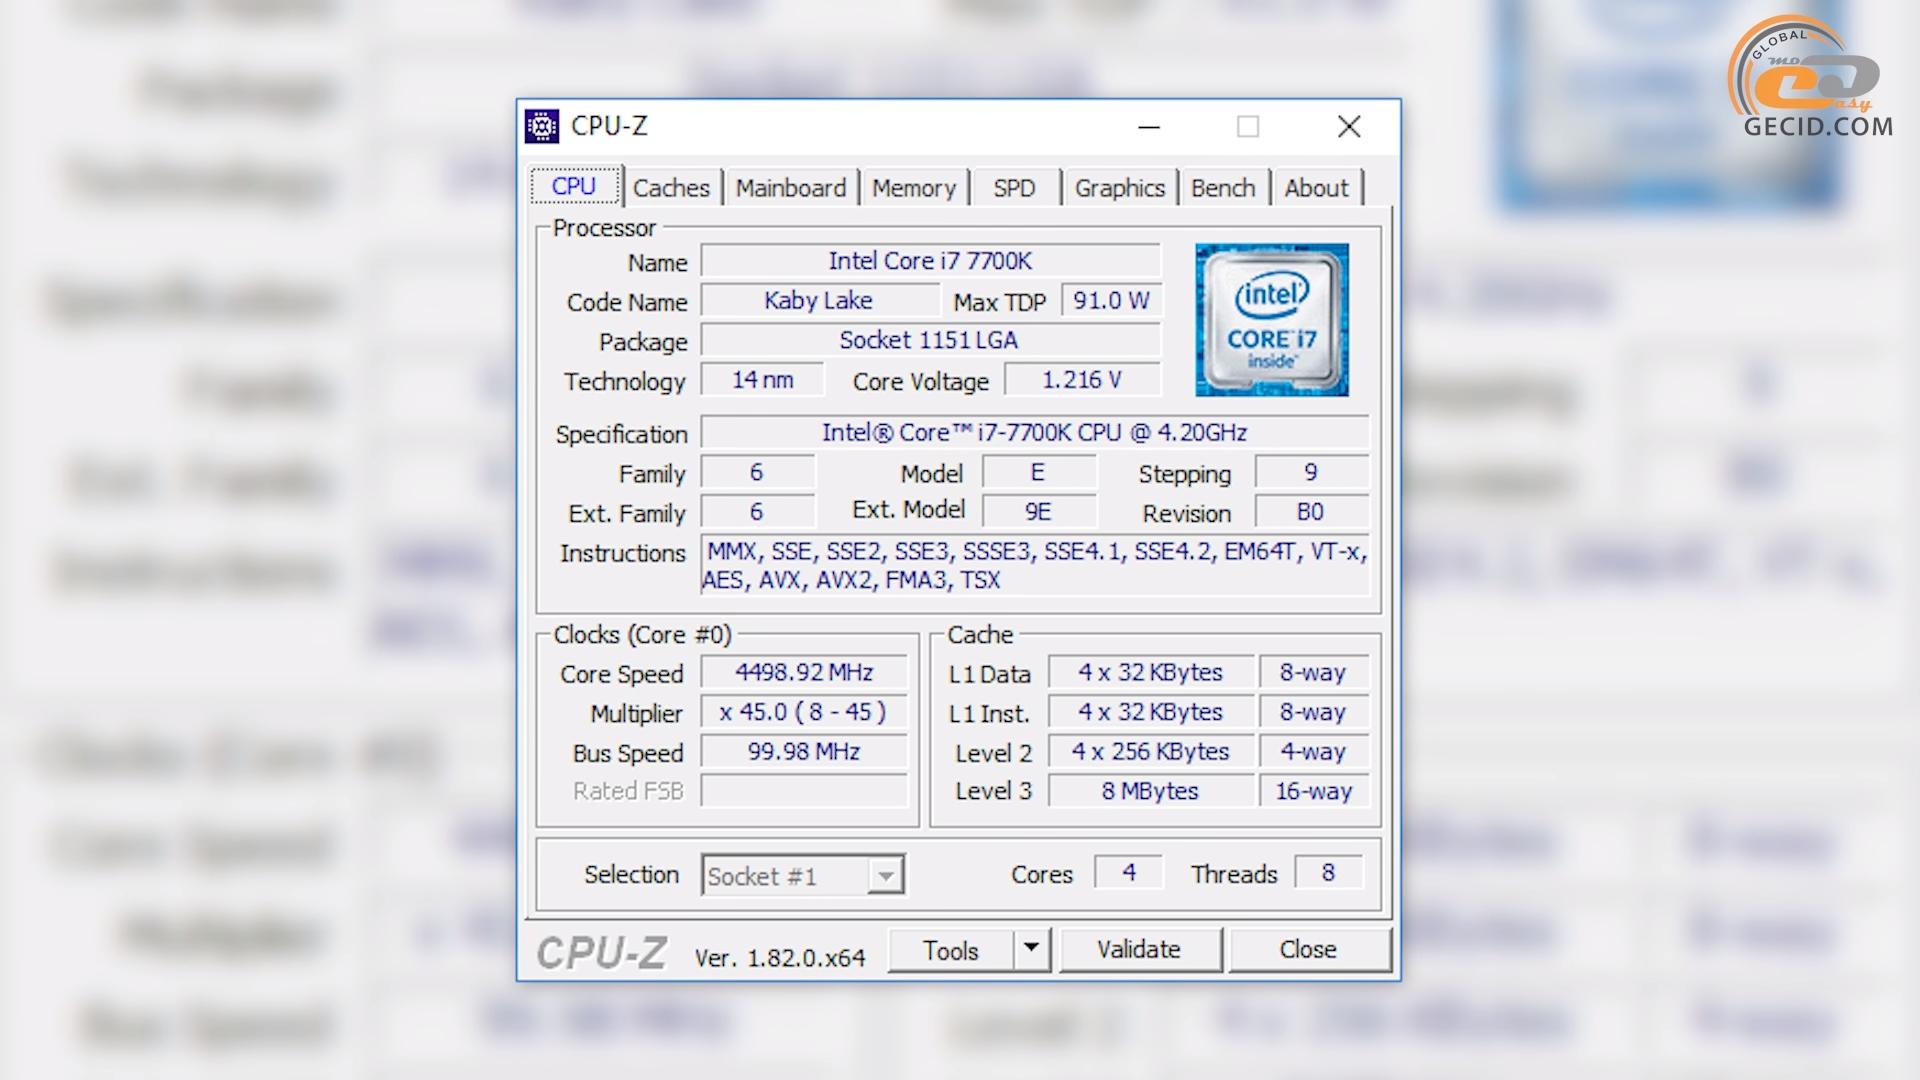 cpu-z i7-7700k